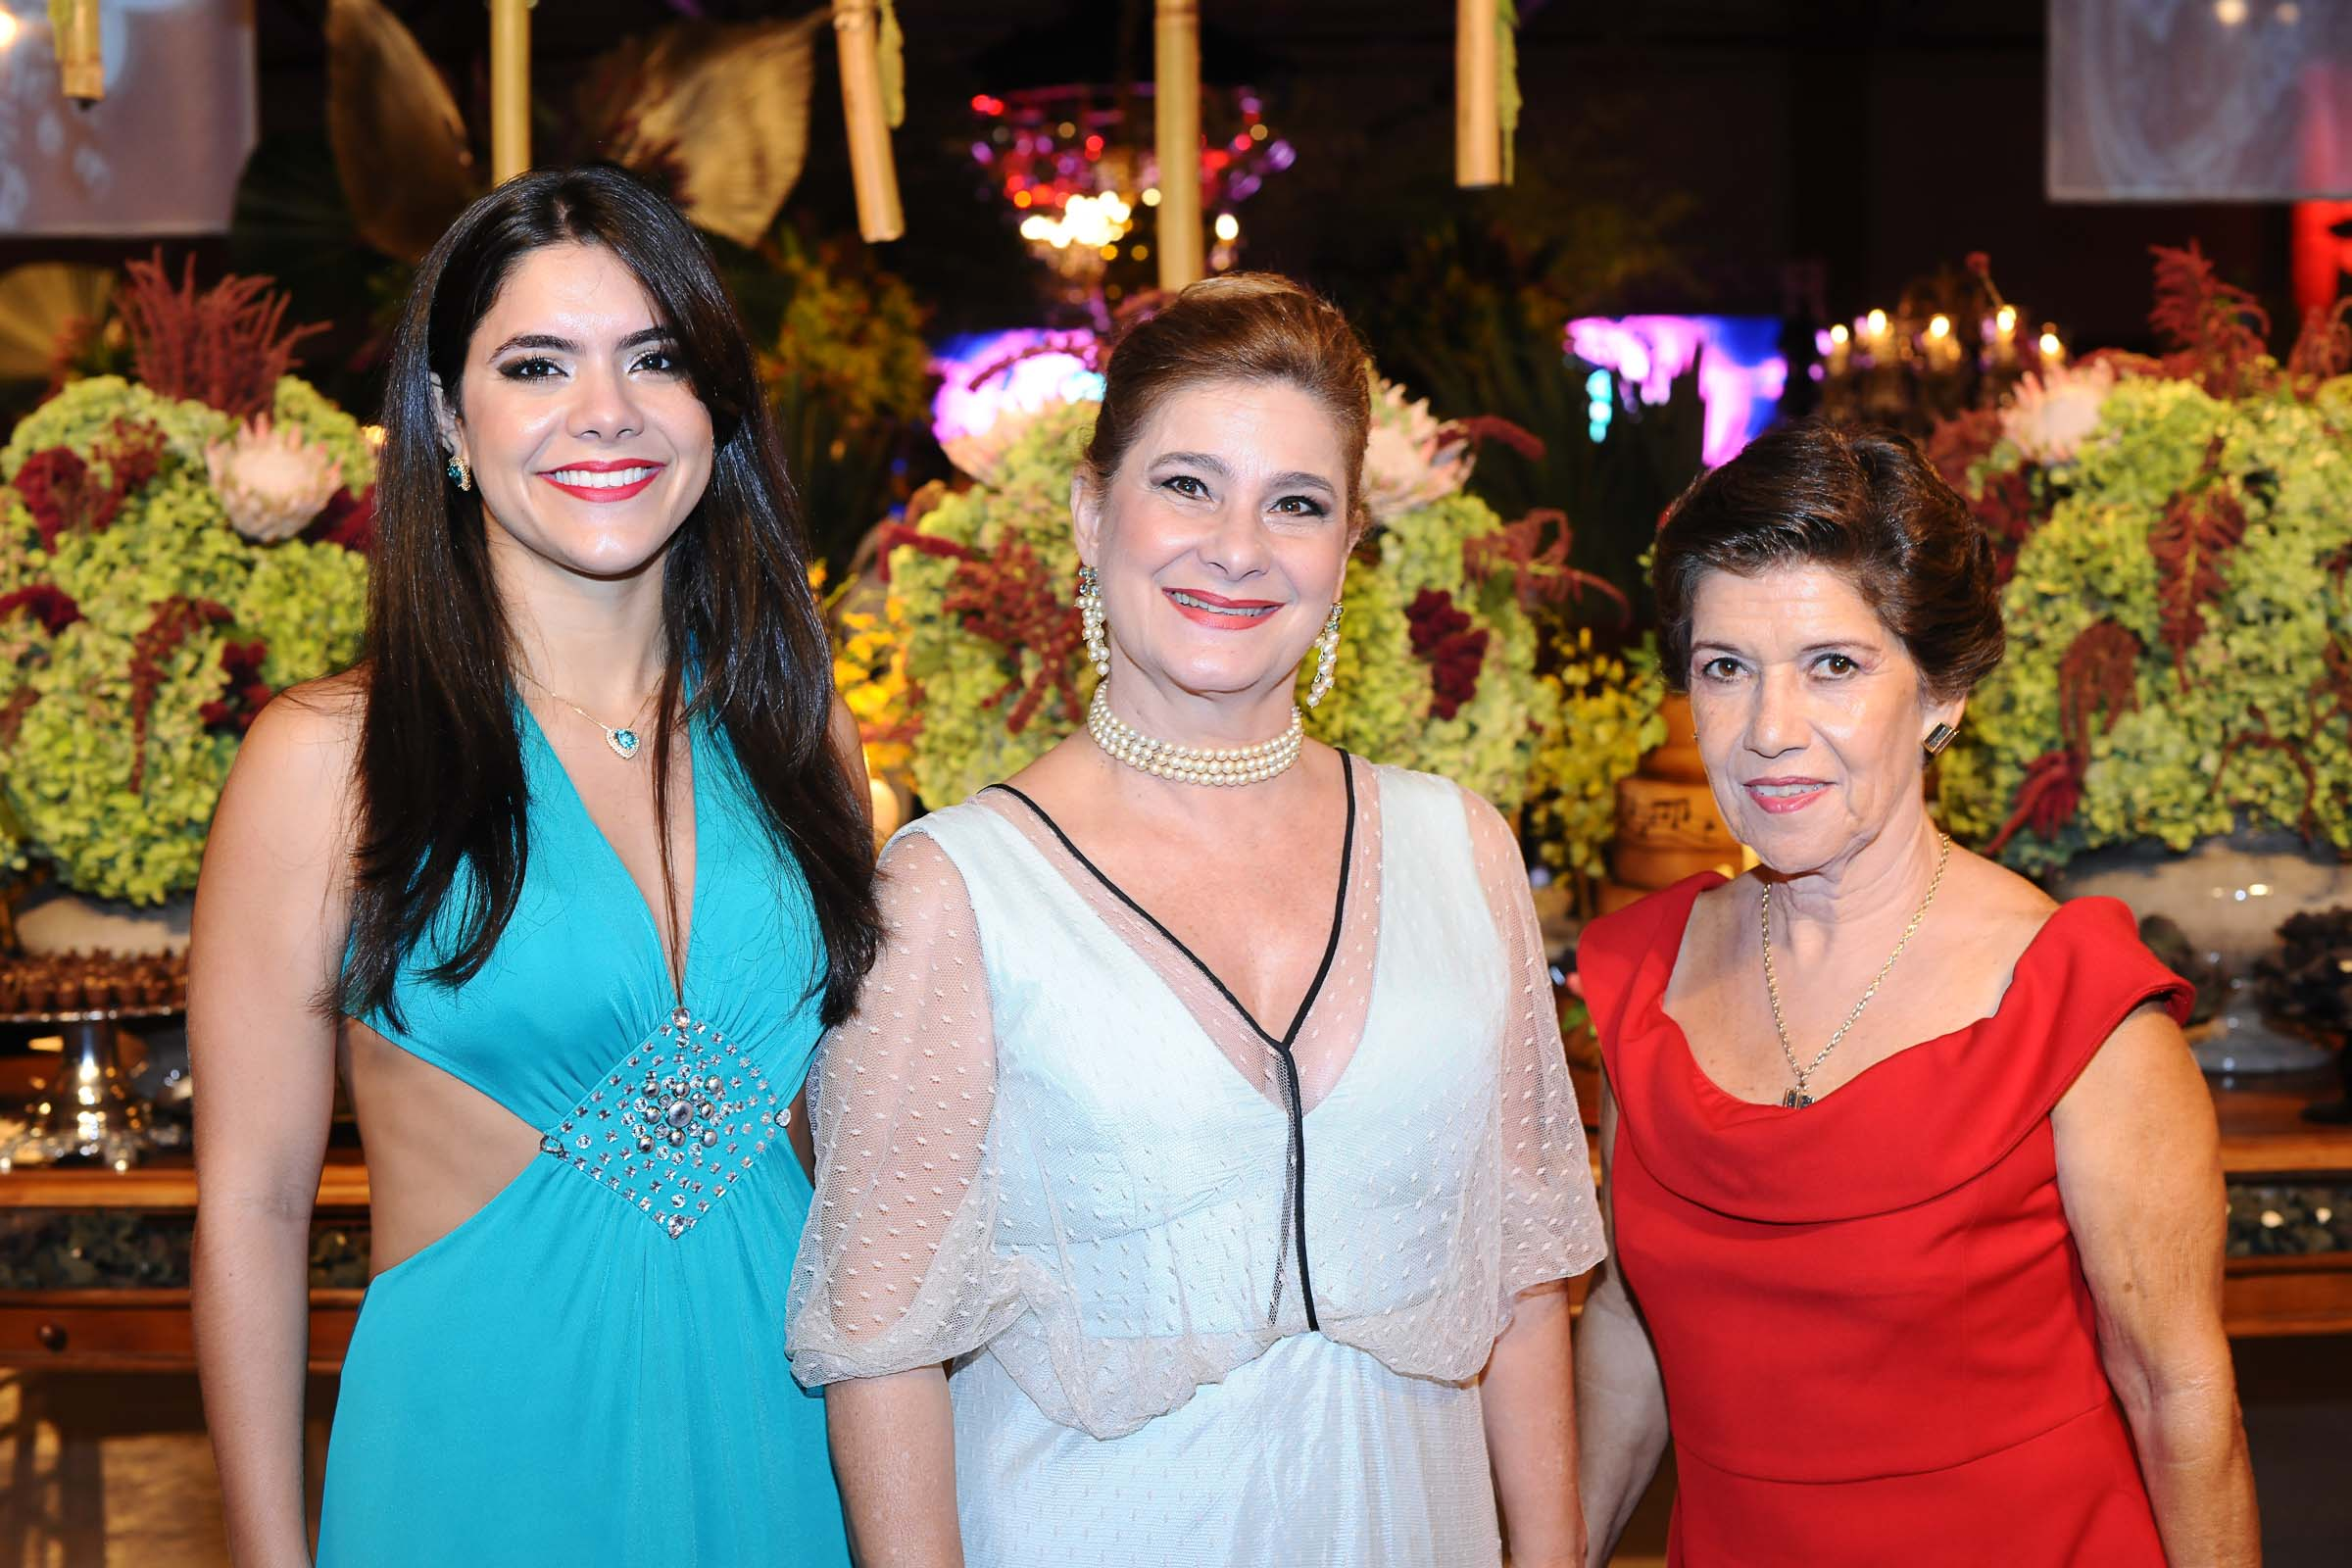 Mayara Neves, Juci Palieraqui e Gil Cleide Alves